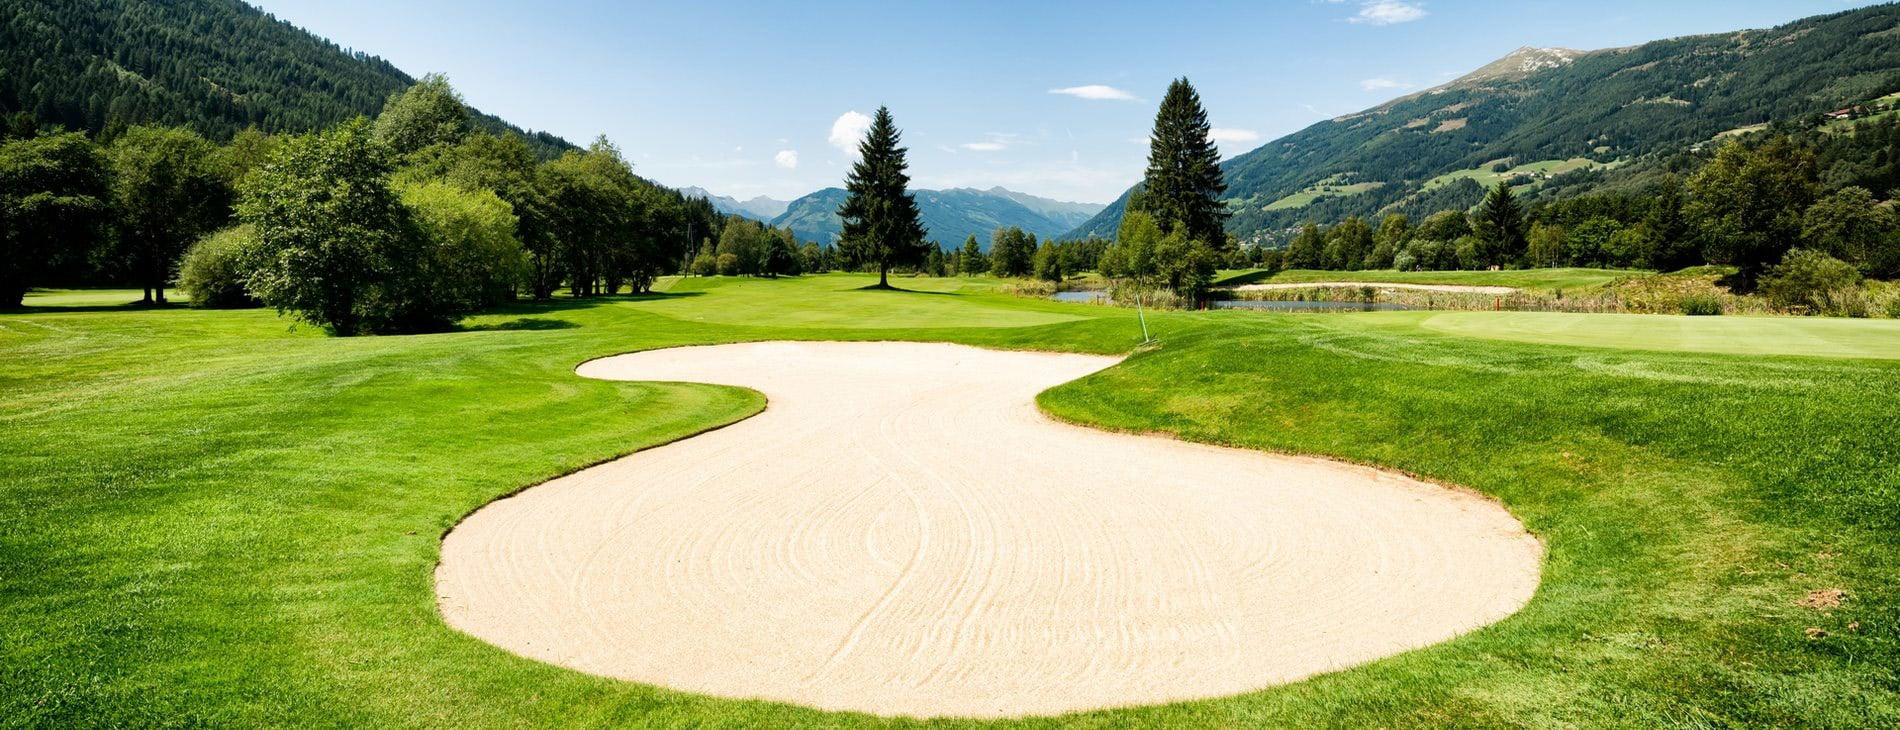 Turnier um den Goldenen Golfball